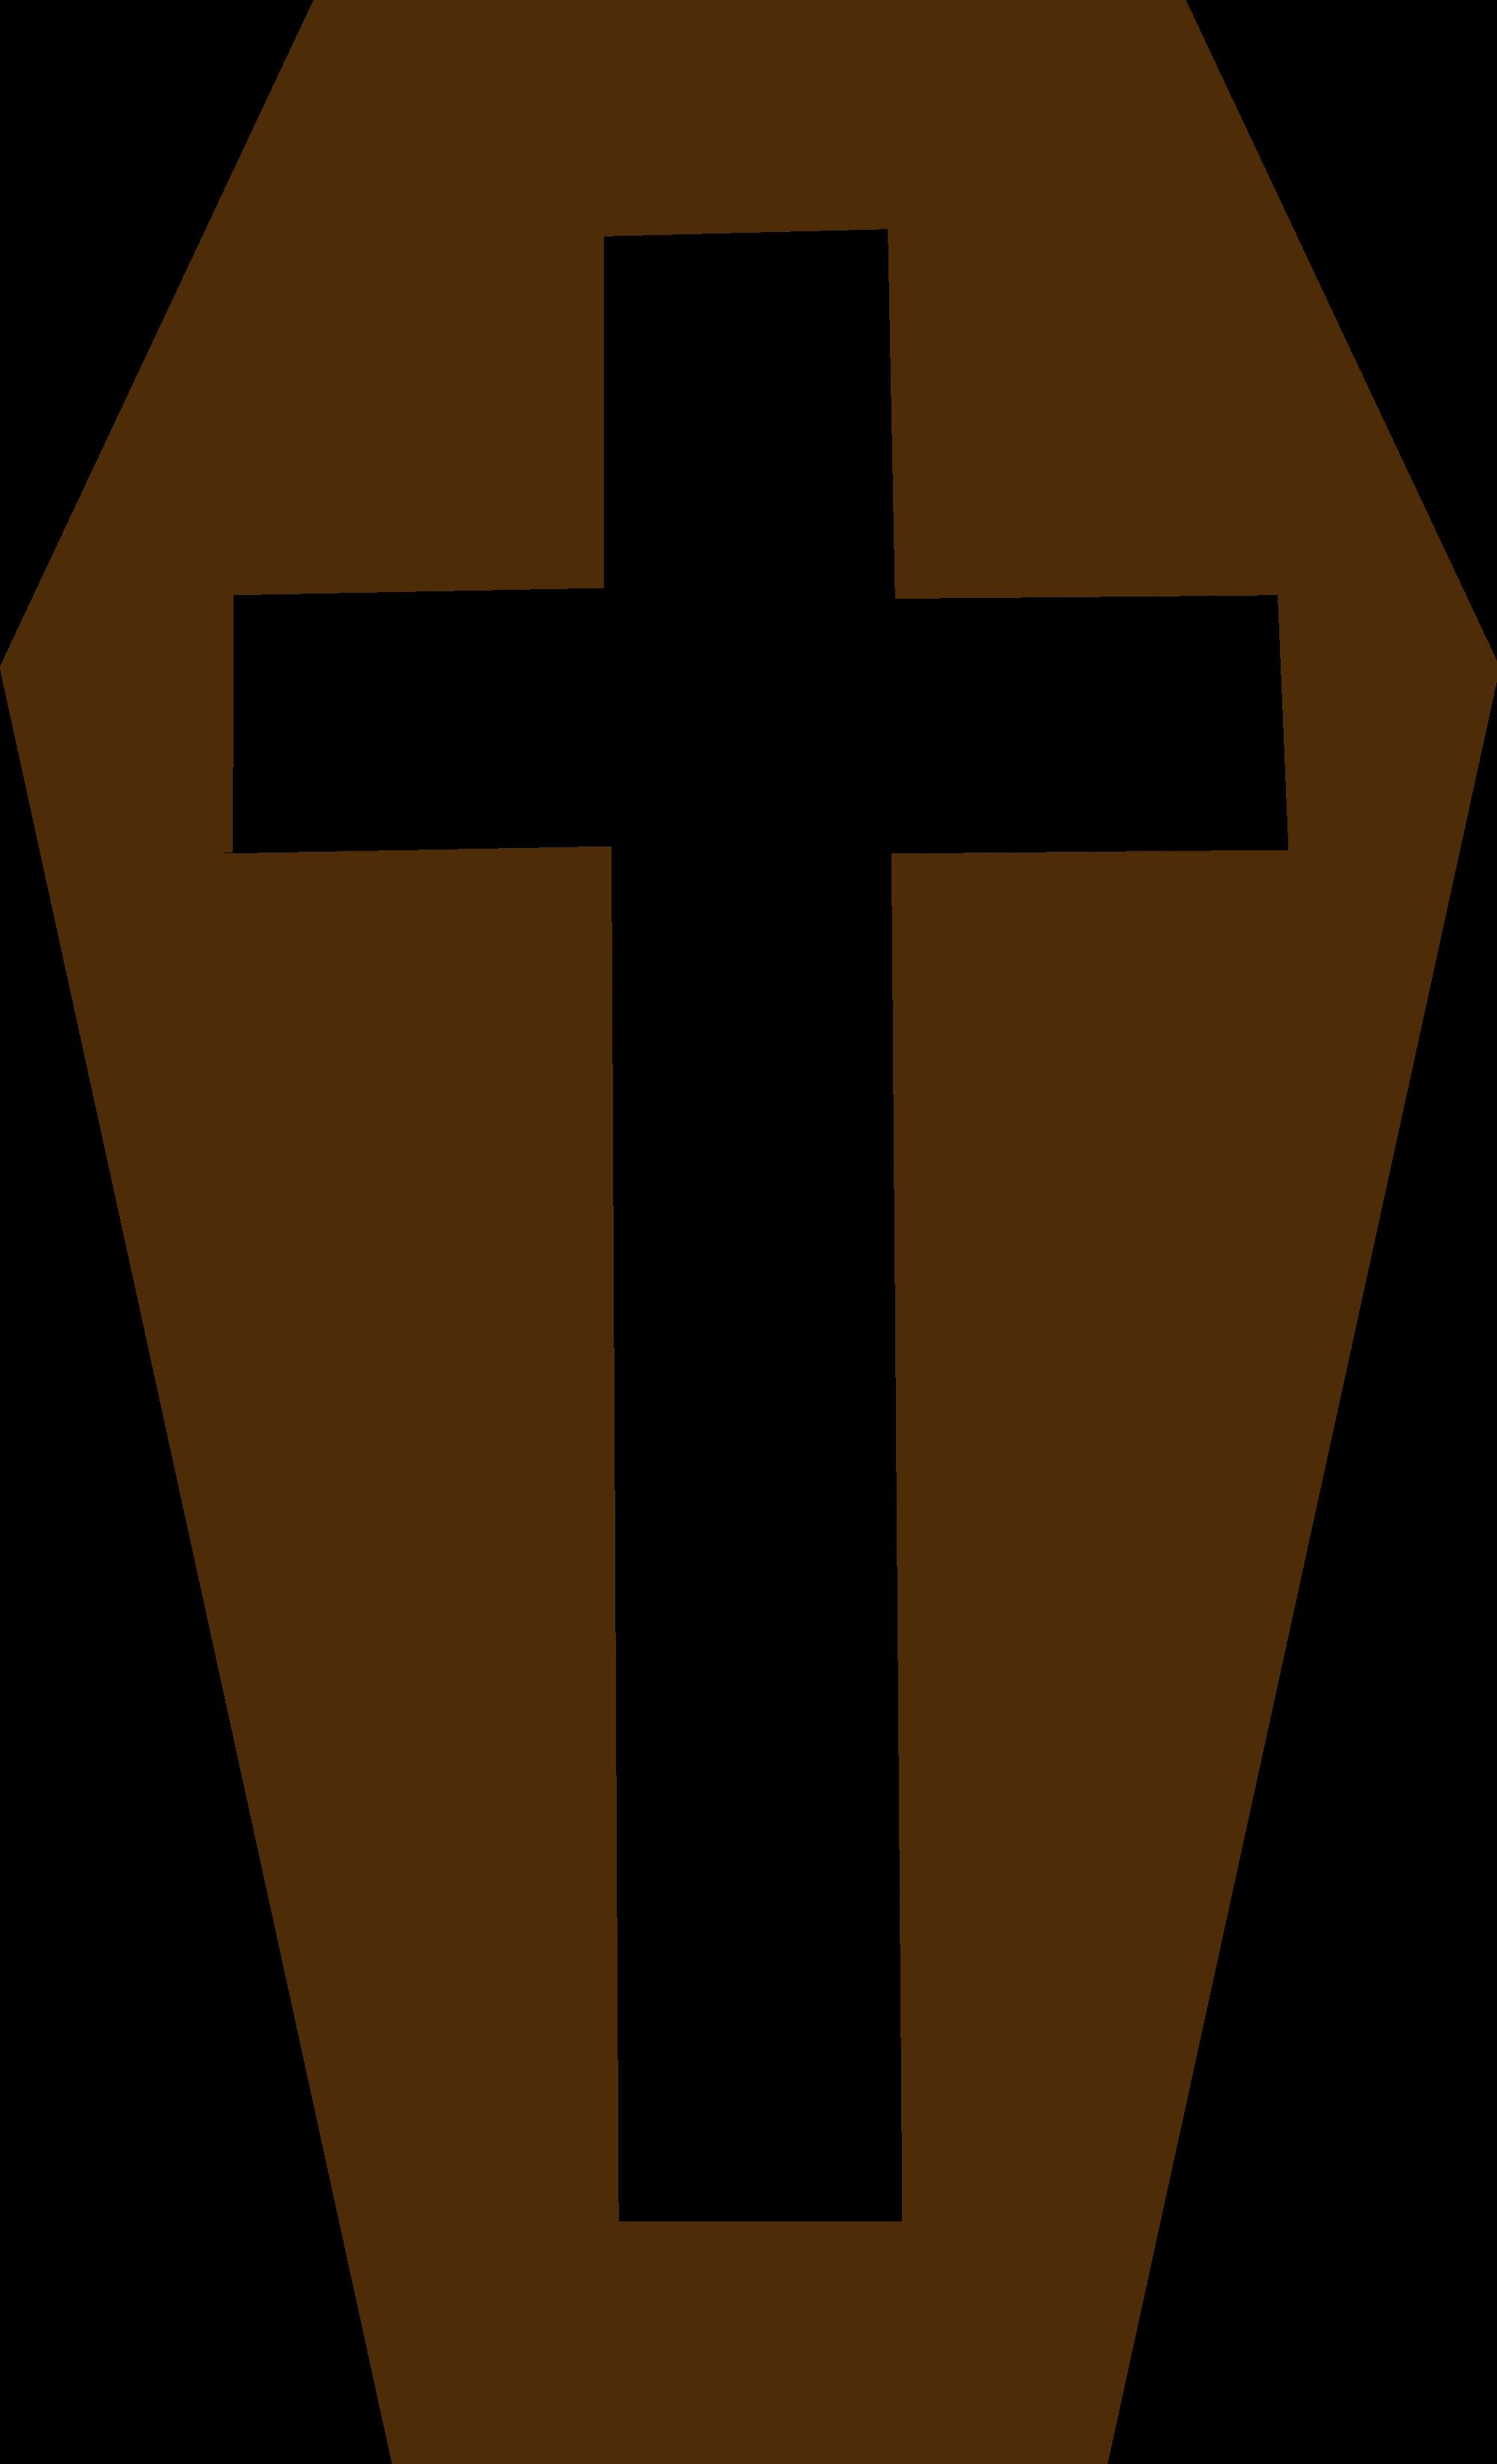 File wikimedia commons open. Coffin clipart svg